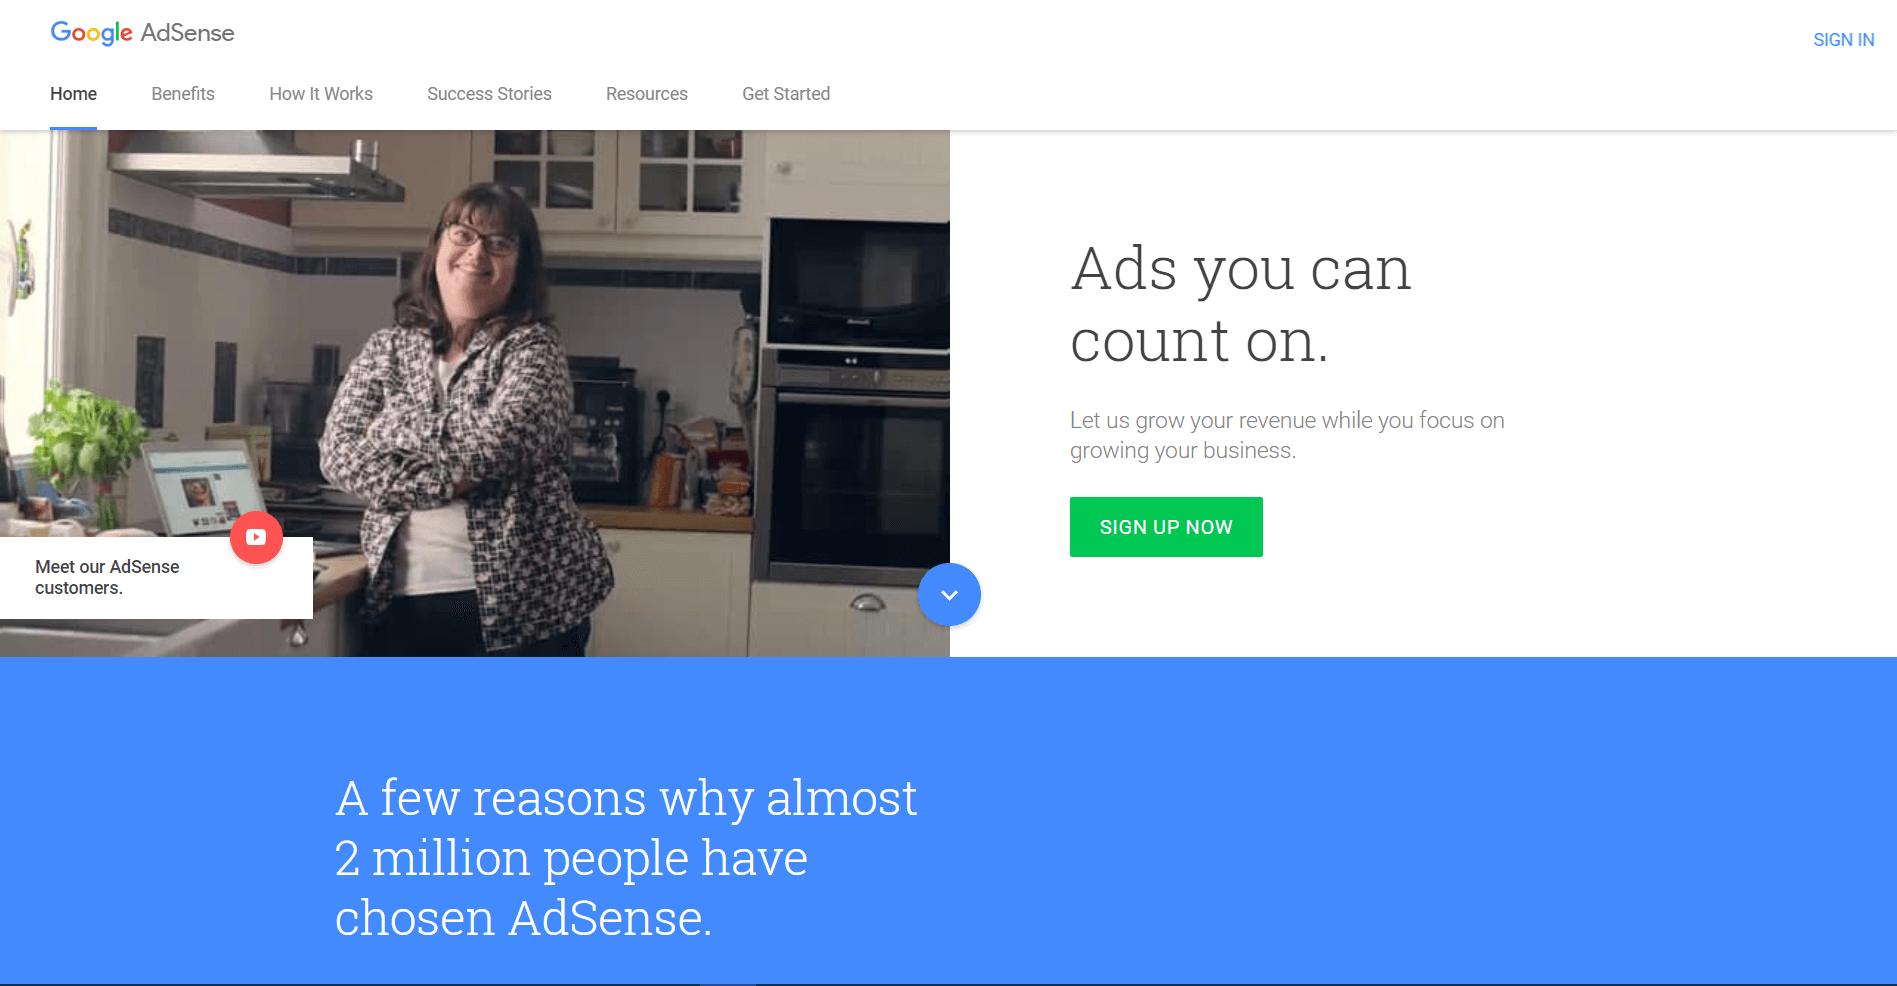 Google AdSense Tools